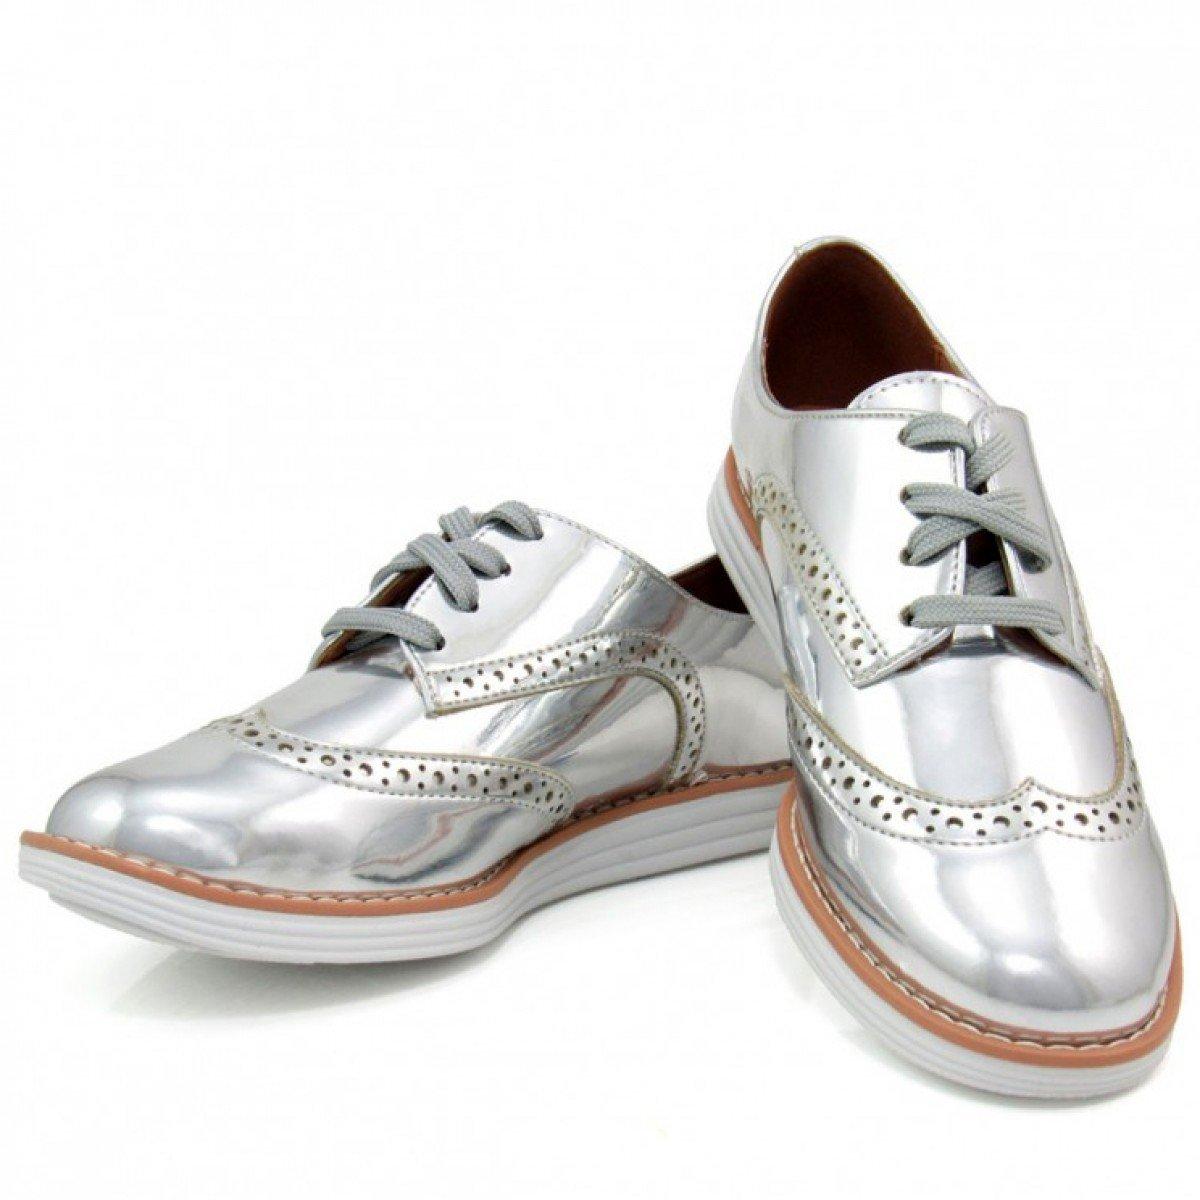 aea918ac8 Sapato Feminino Oxford Vizzano Metalizado - Compre Agora  Cabana ...